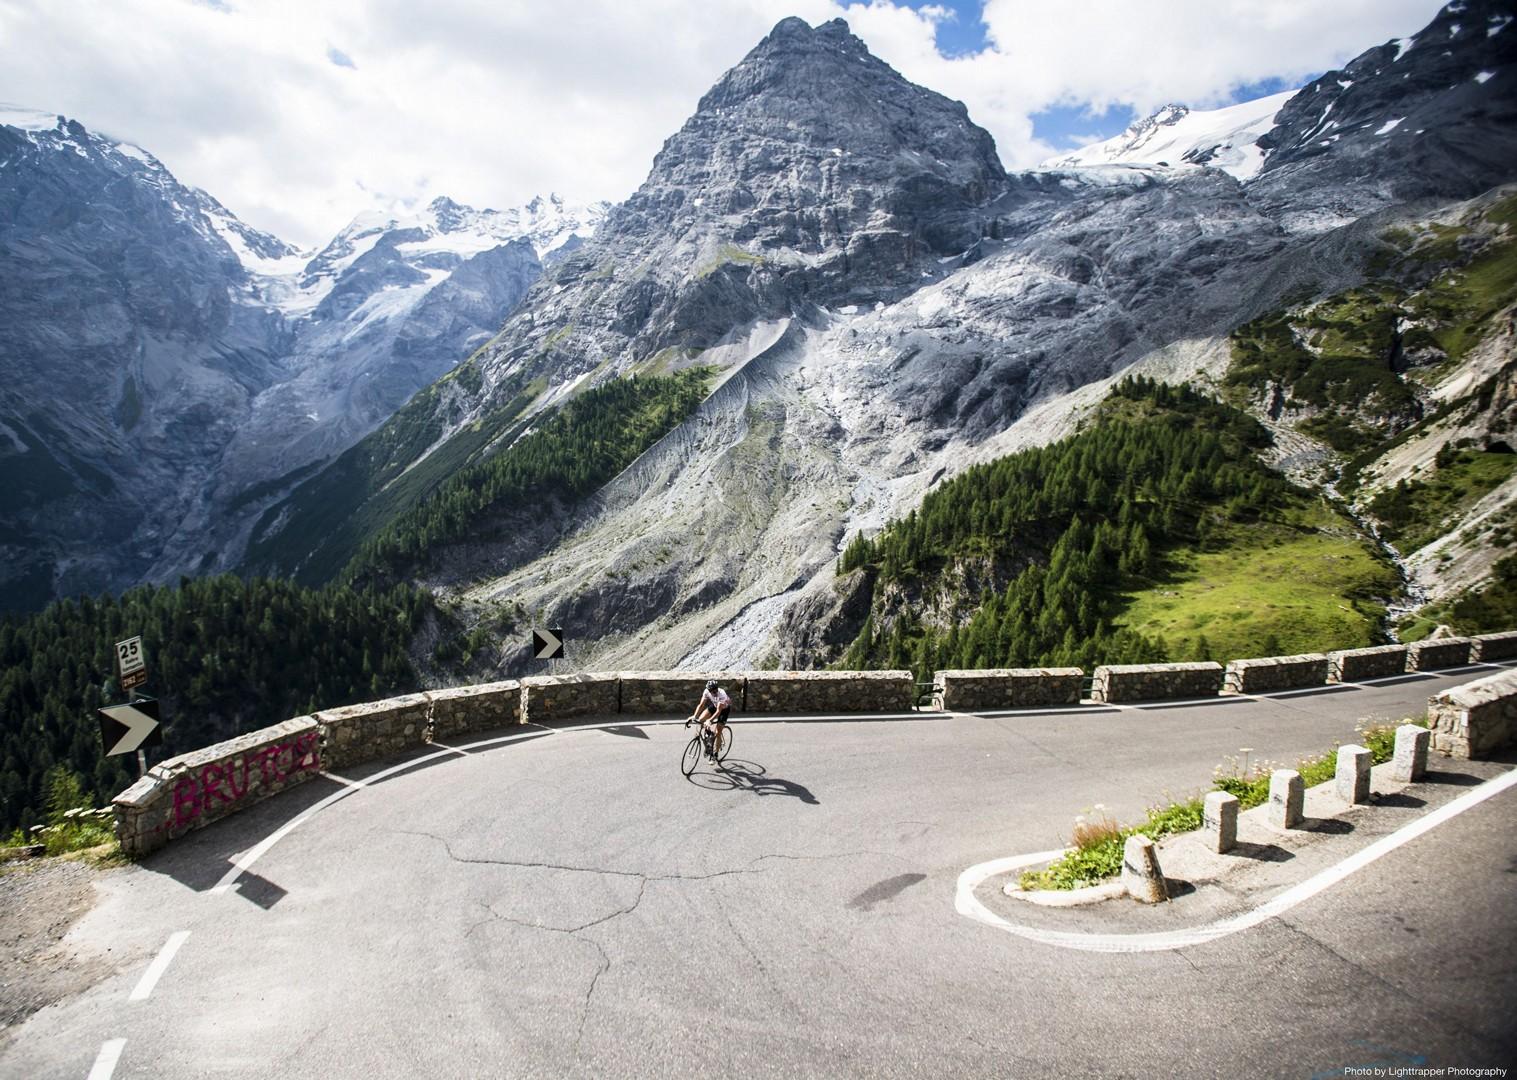 italy-italian-alps-guided-road-cycling-holiday.jpg - Italy - Italian Alps Introduction - Guided Road Cycling Holiday - Italia Road Cycling